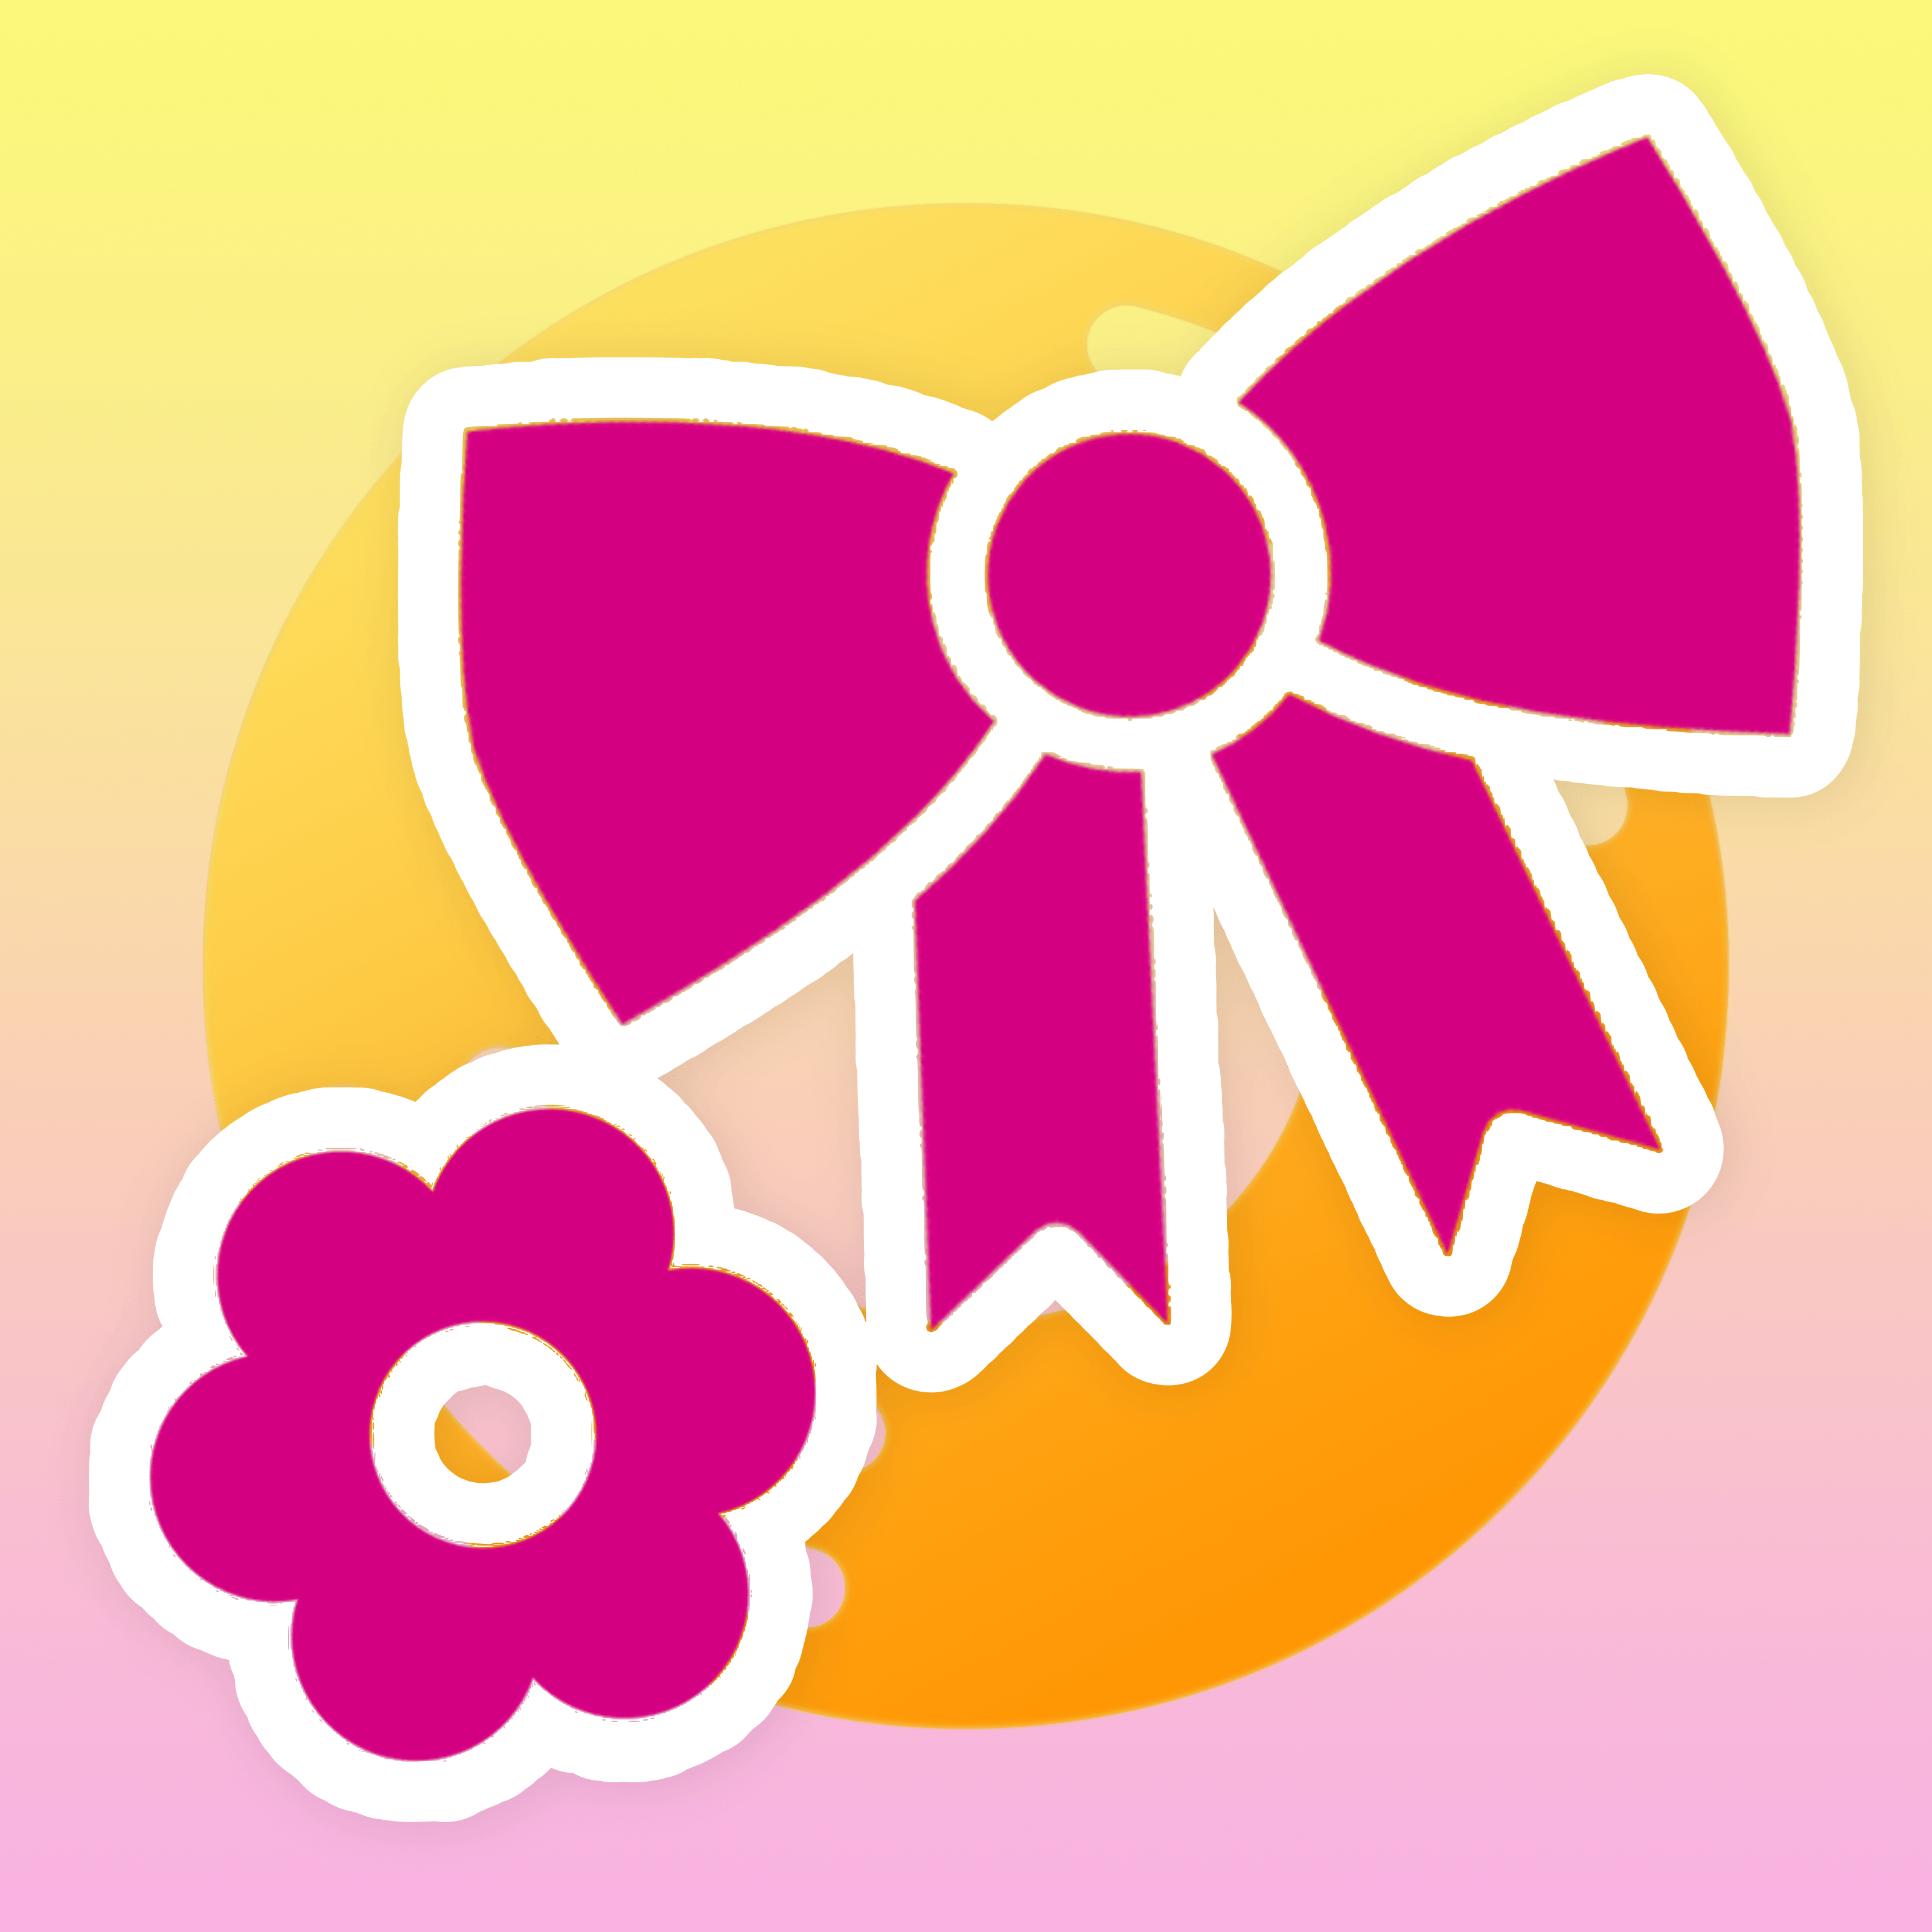 Yuzuki_2020 avatar